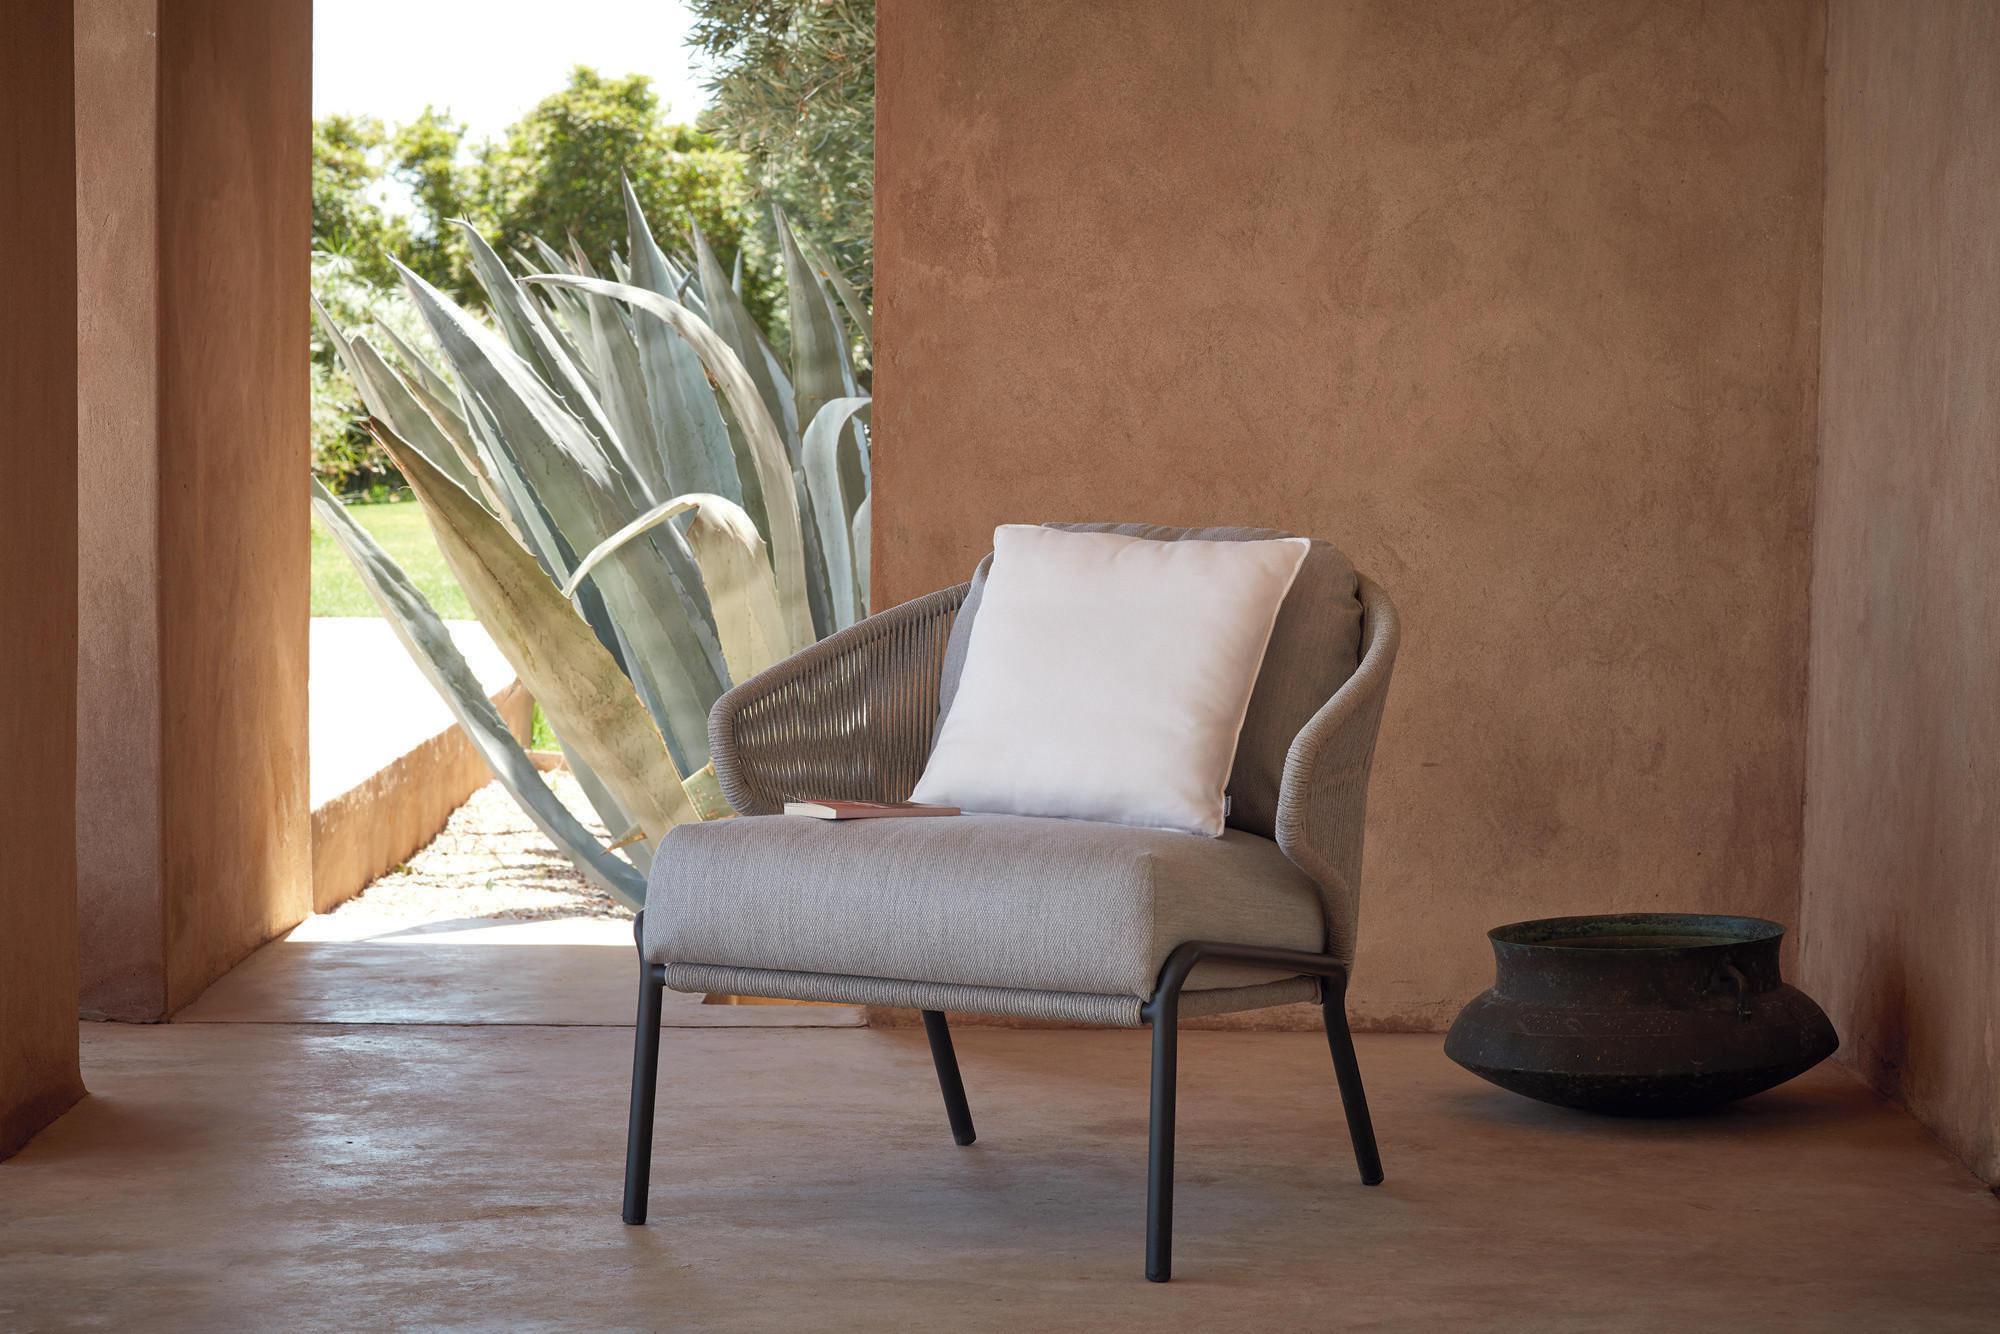 Radius fauteuil dans un patio